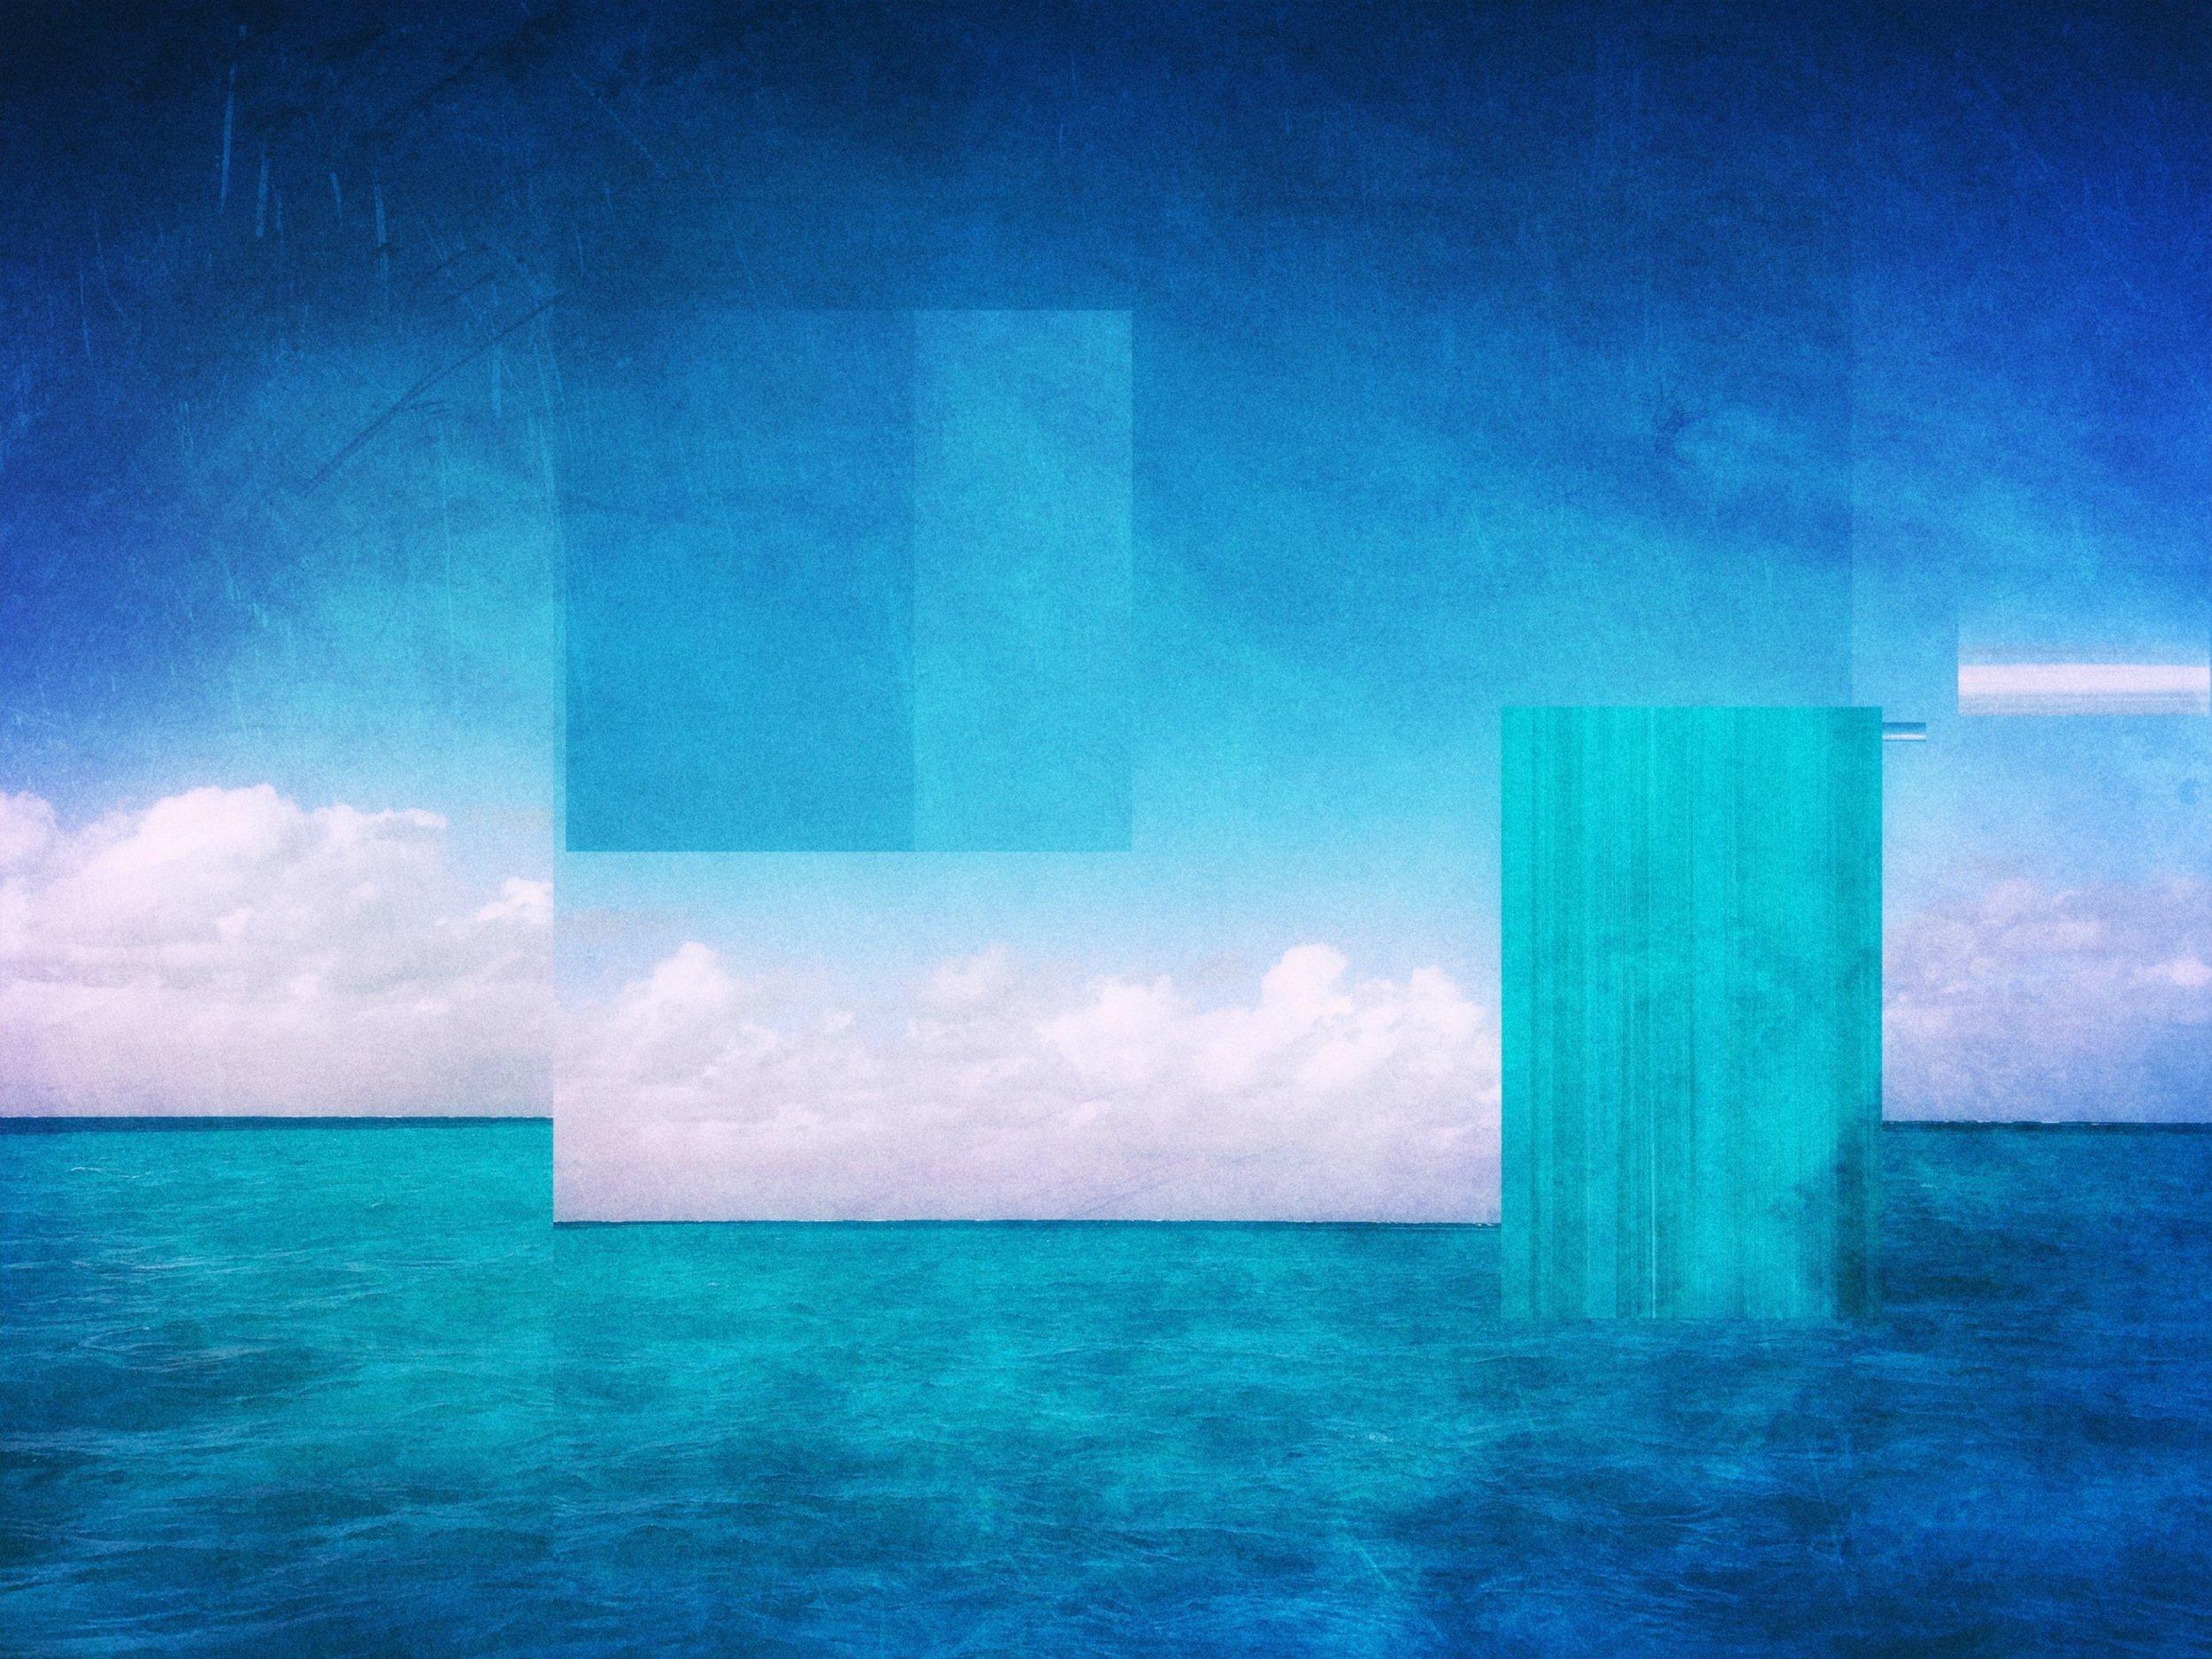 jonathan_laurence_gltch_ocean_blocks.jpg